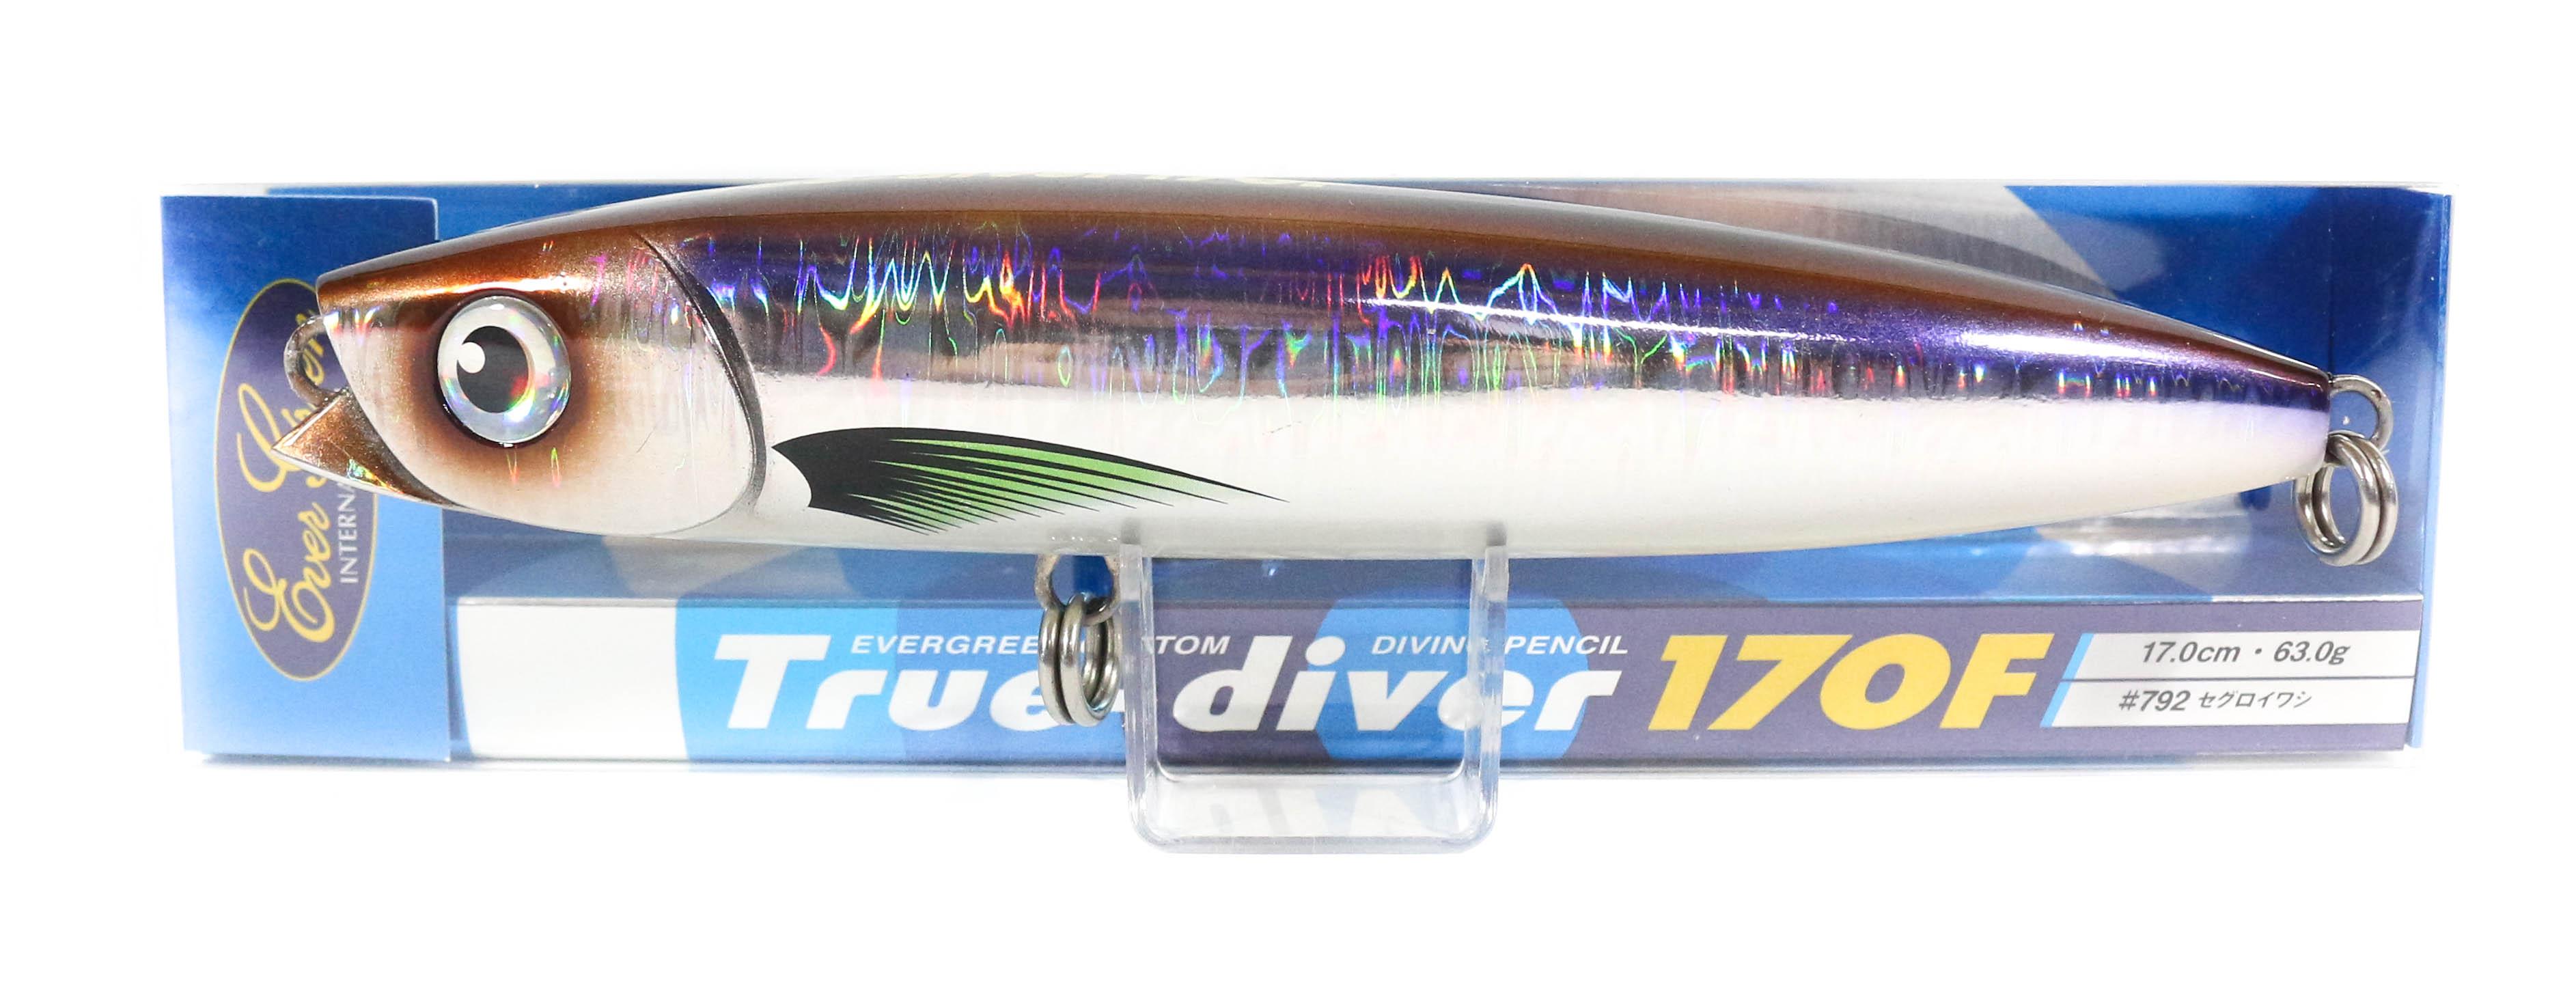 Sale Evergreen True Diver 170F Pencil 63 gram Floating Lure 792 (8214)